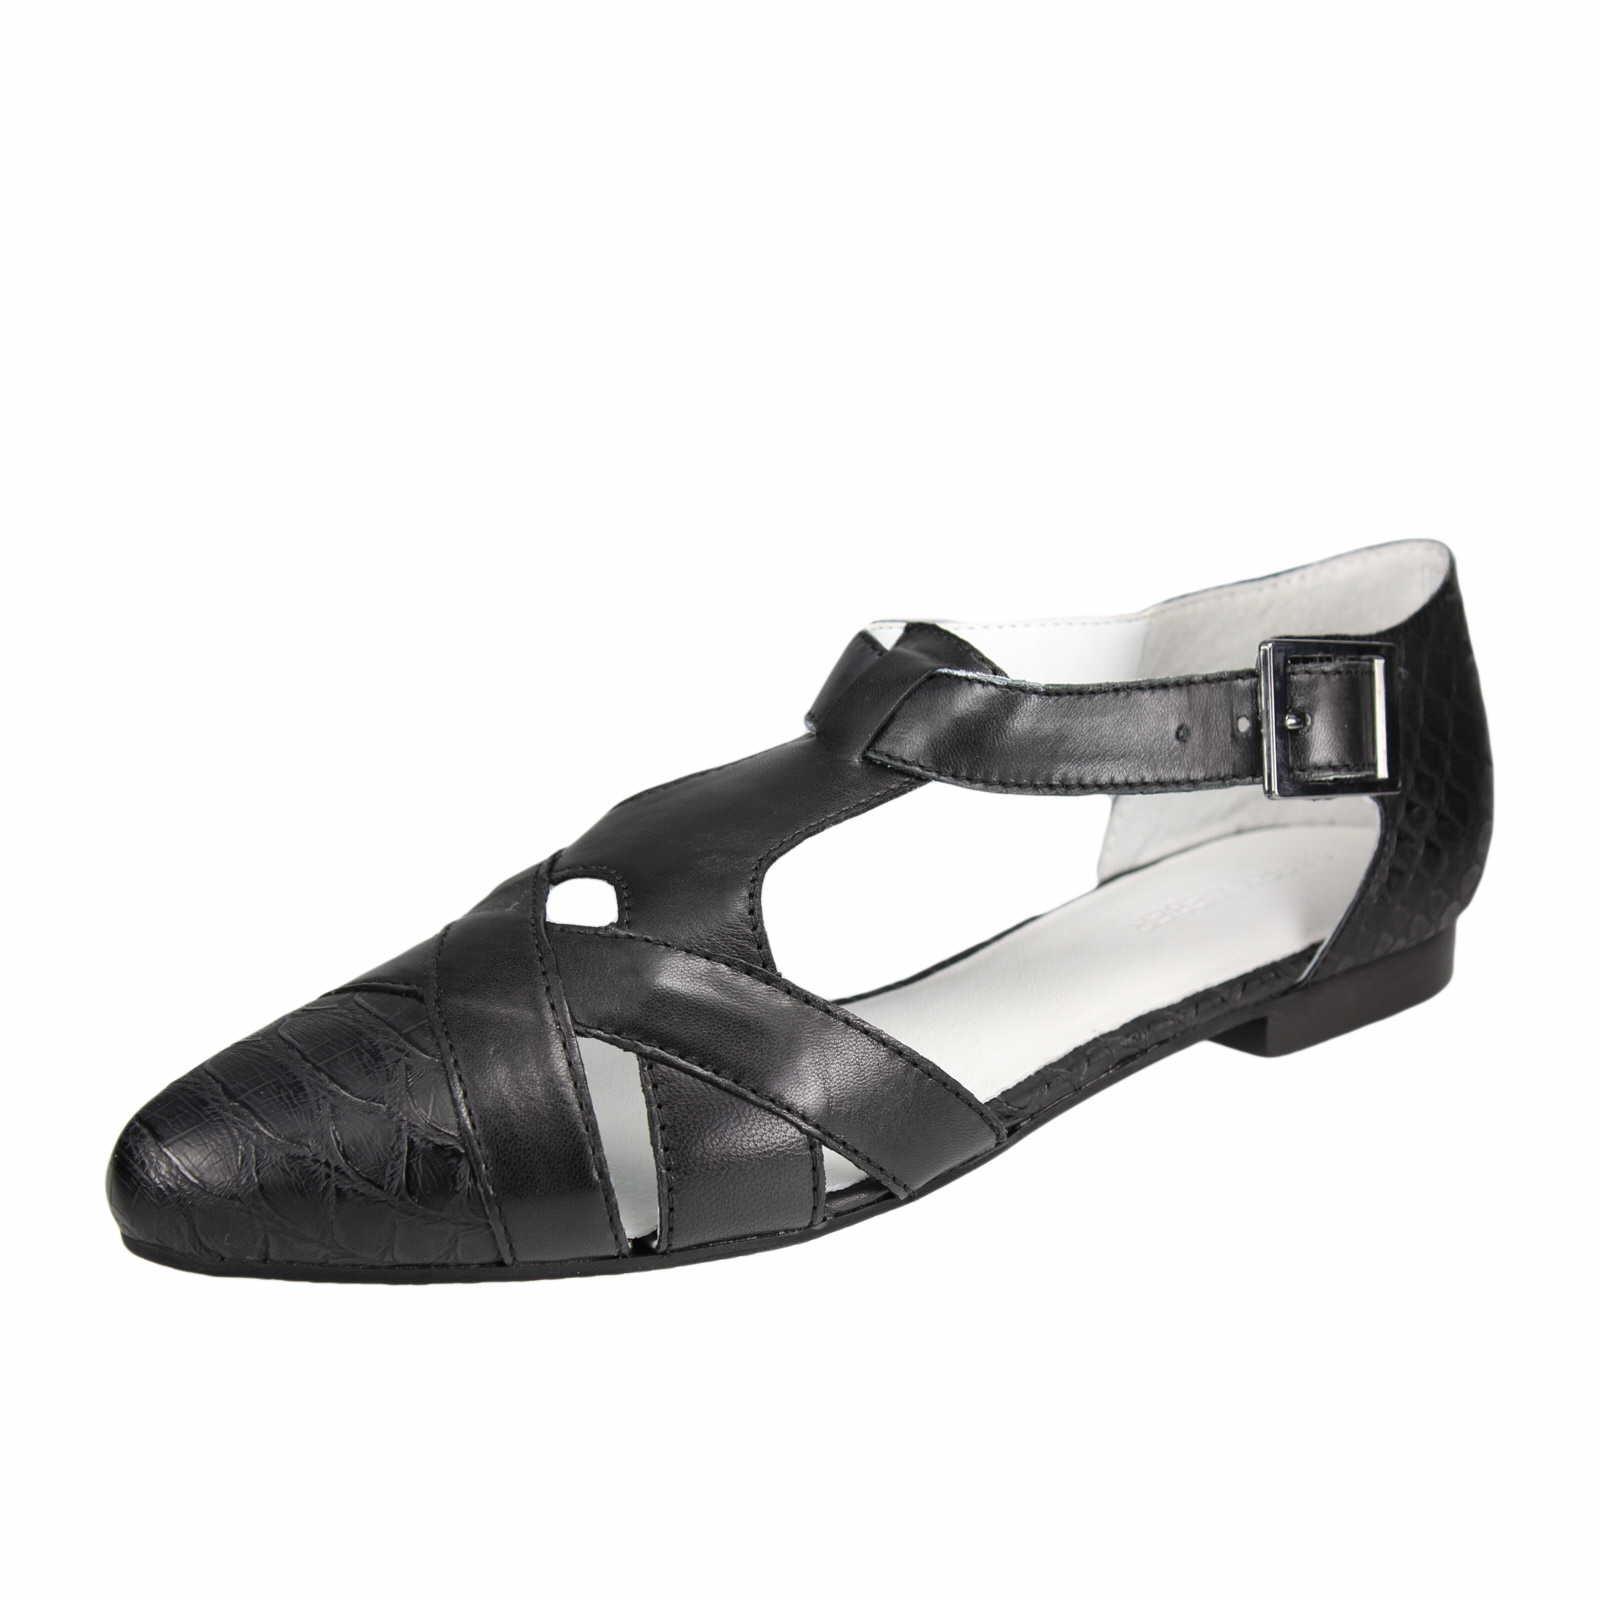 gerry weber shoes schwarz edith 07 g61007 845 100 schuhparadies online shop schuhe. Black Bedroom Furniture Sets. Home Design Ideas